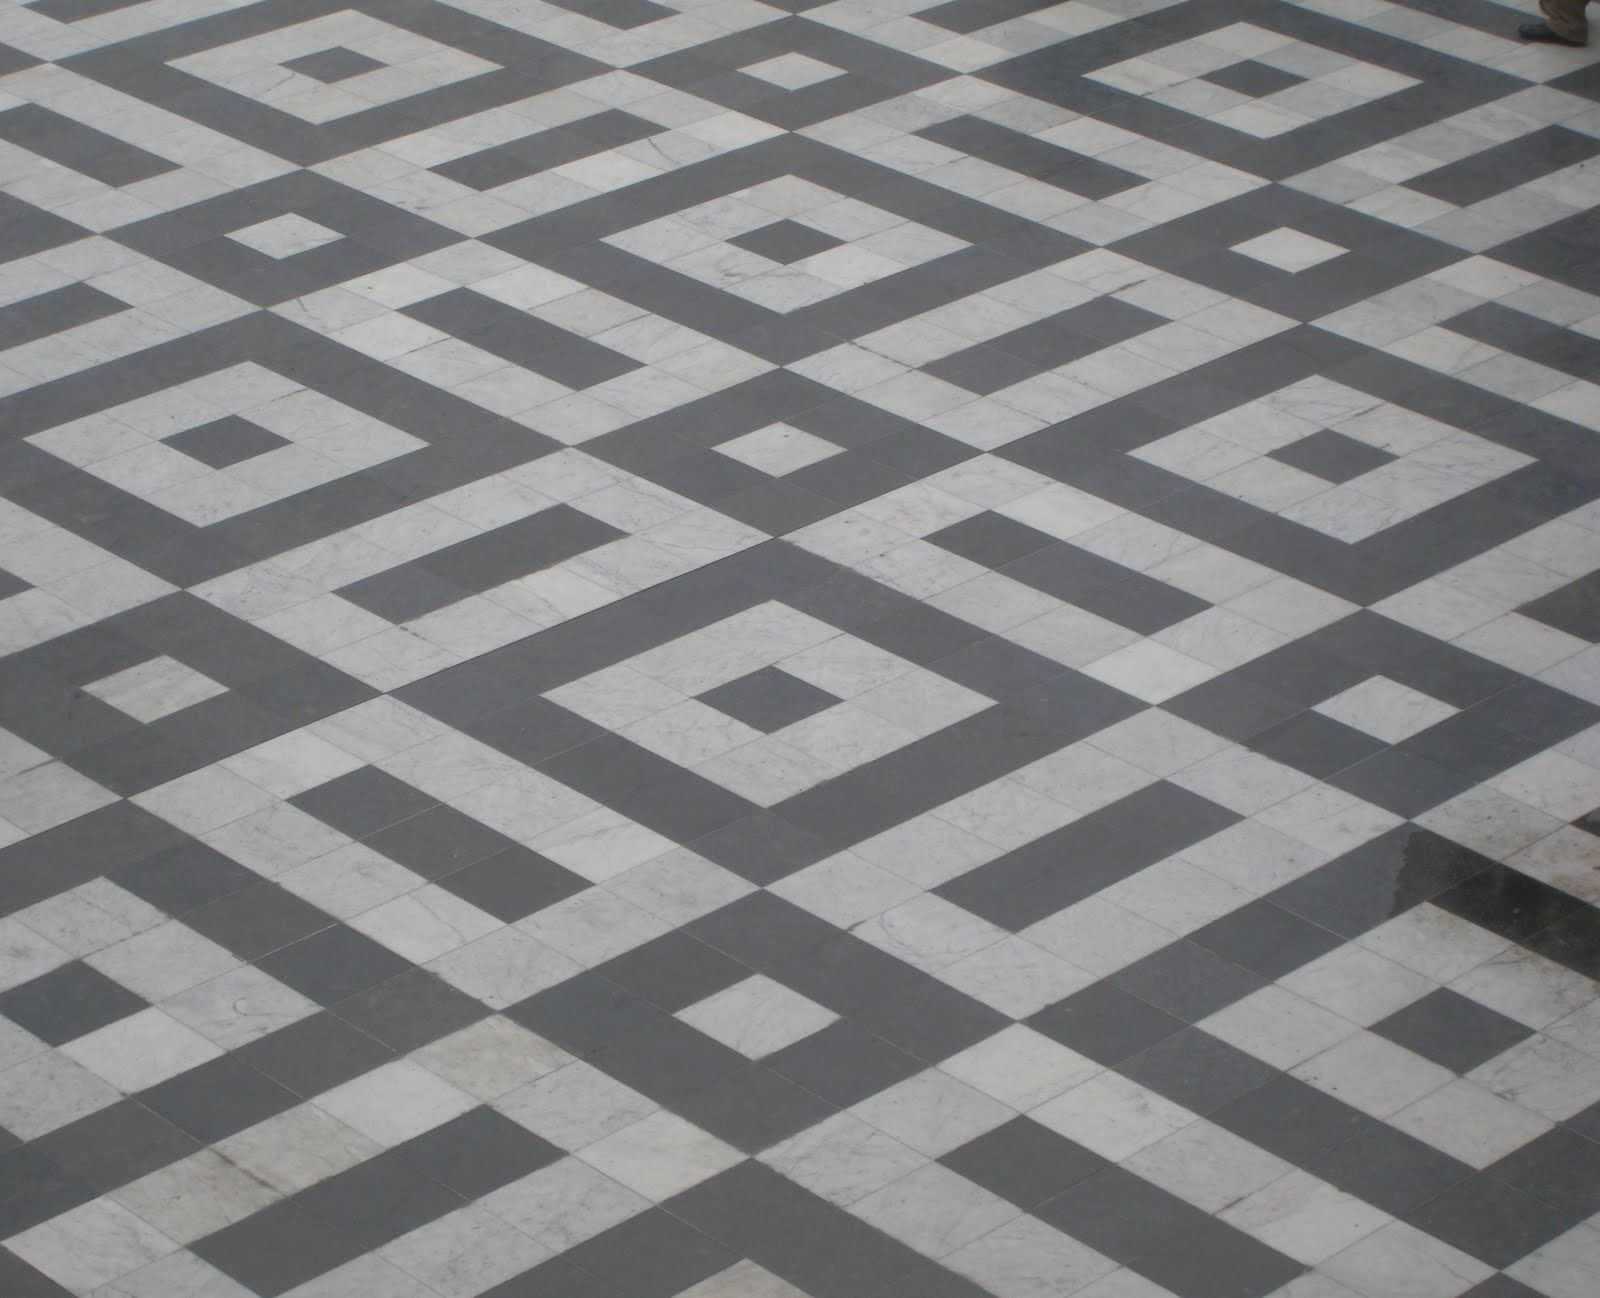 Antique floor mosaic from paris patroon 10x10 cm tegels